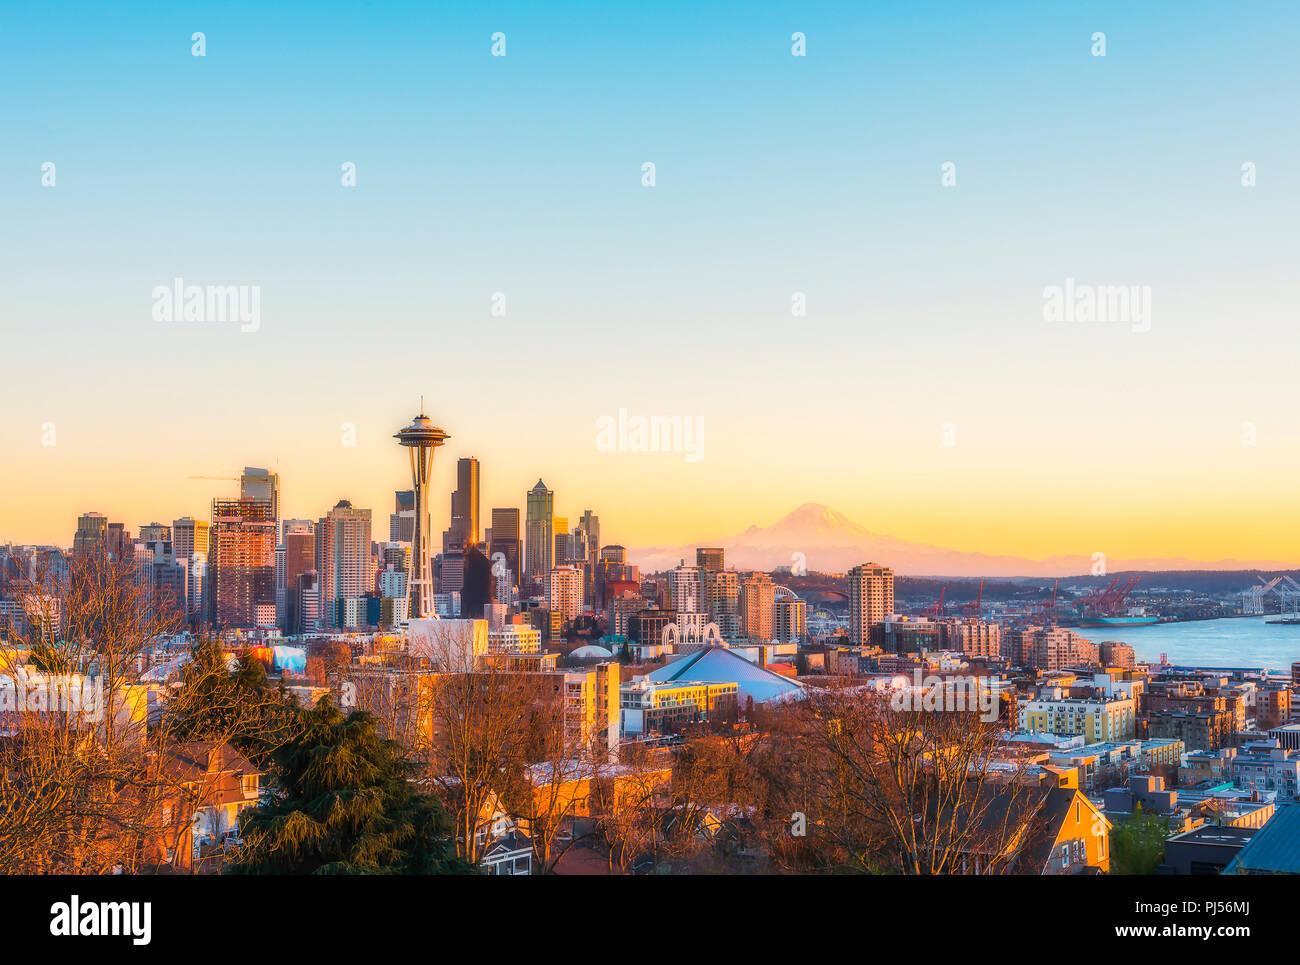 Schöne Seattle City Skyline im Sonnenuntergang, Washington, USA. Stockfoto